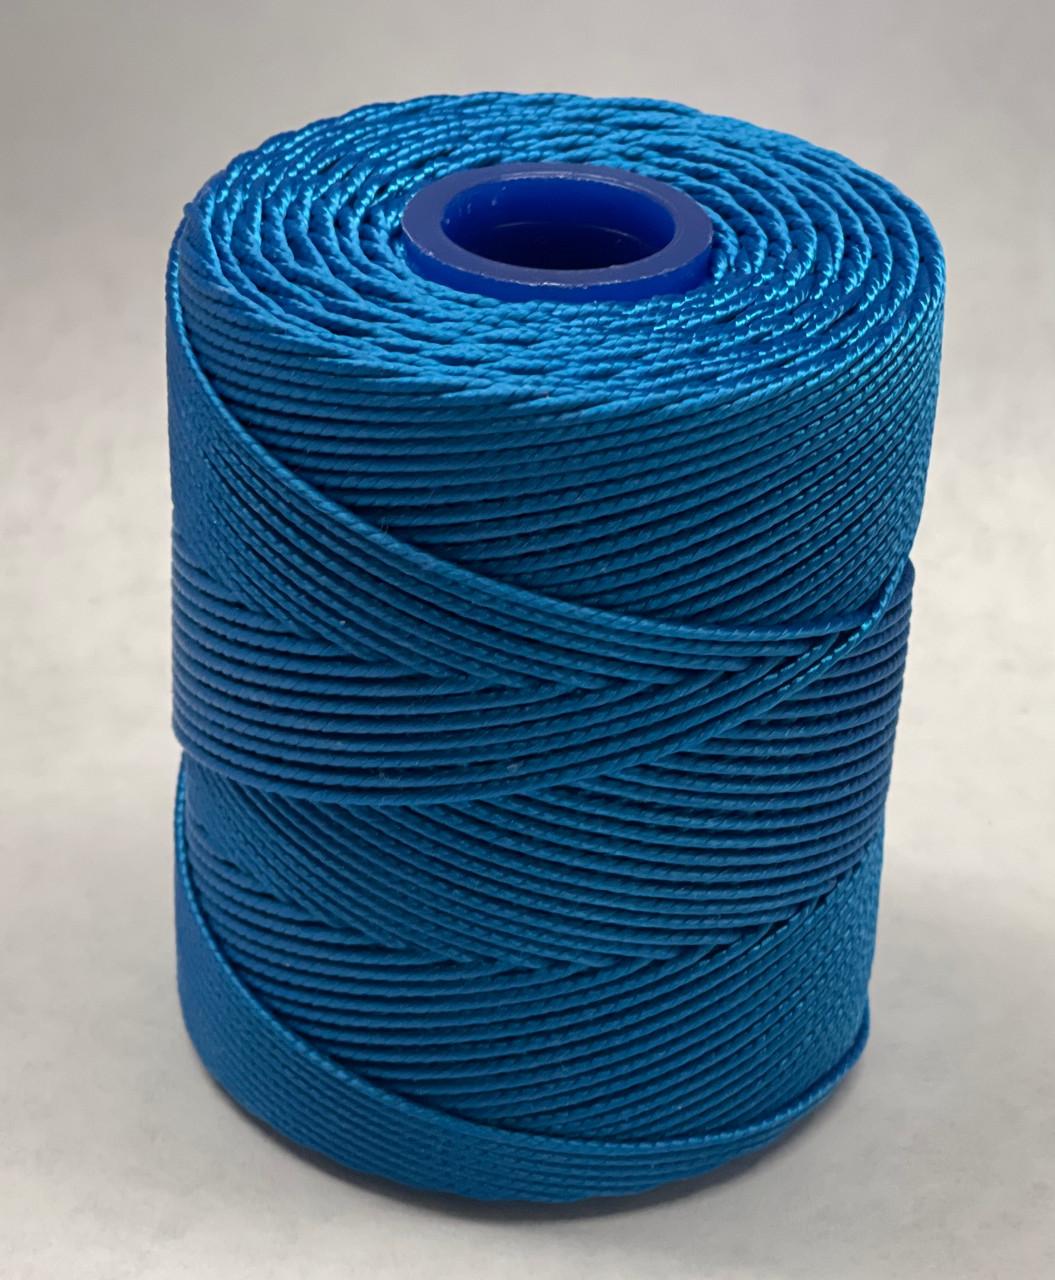 No.5 Electric Blue Butchers String/Twine - Henry Winning